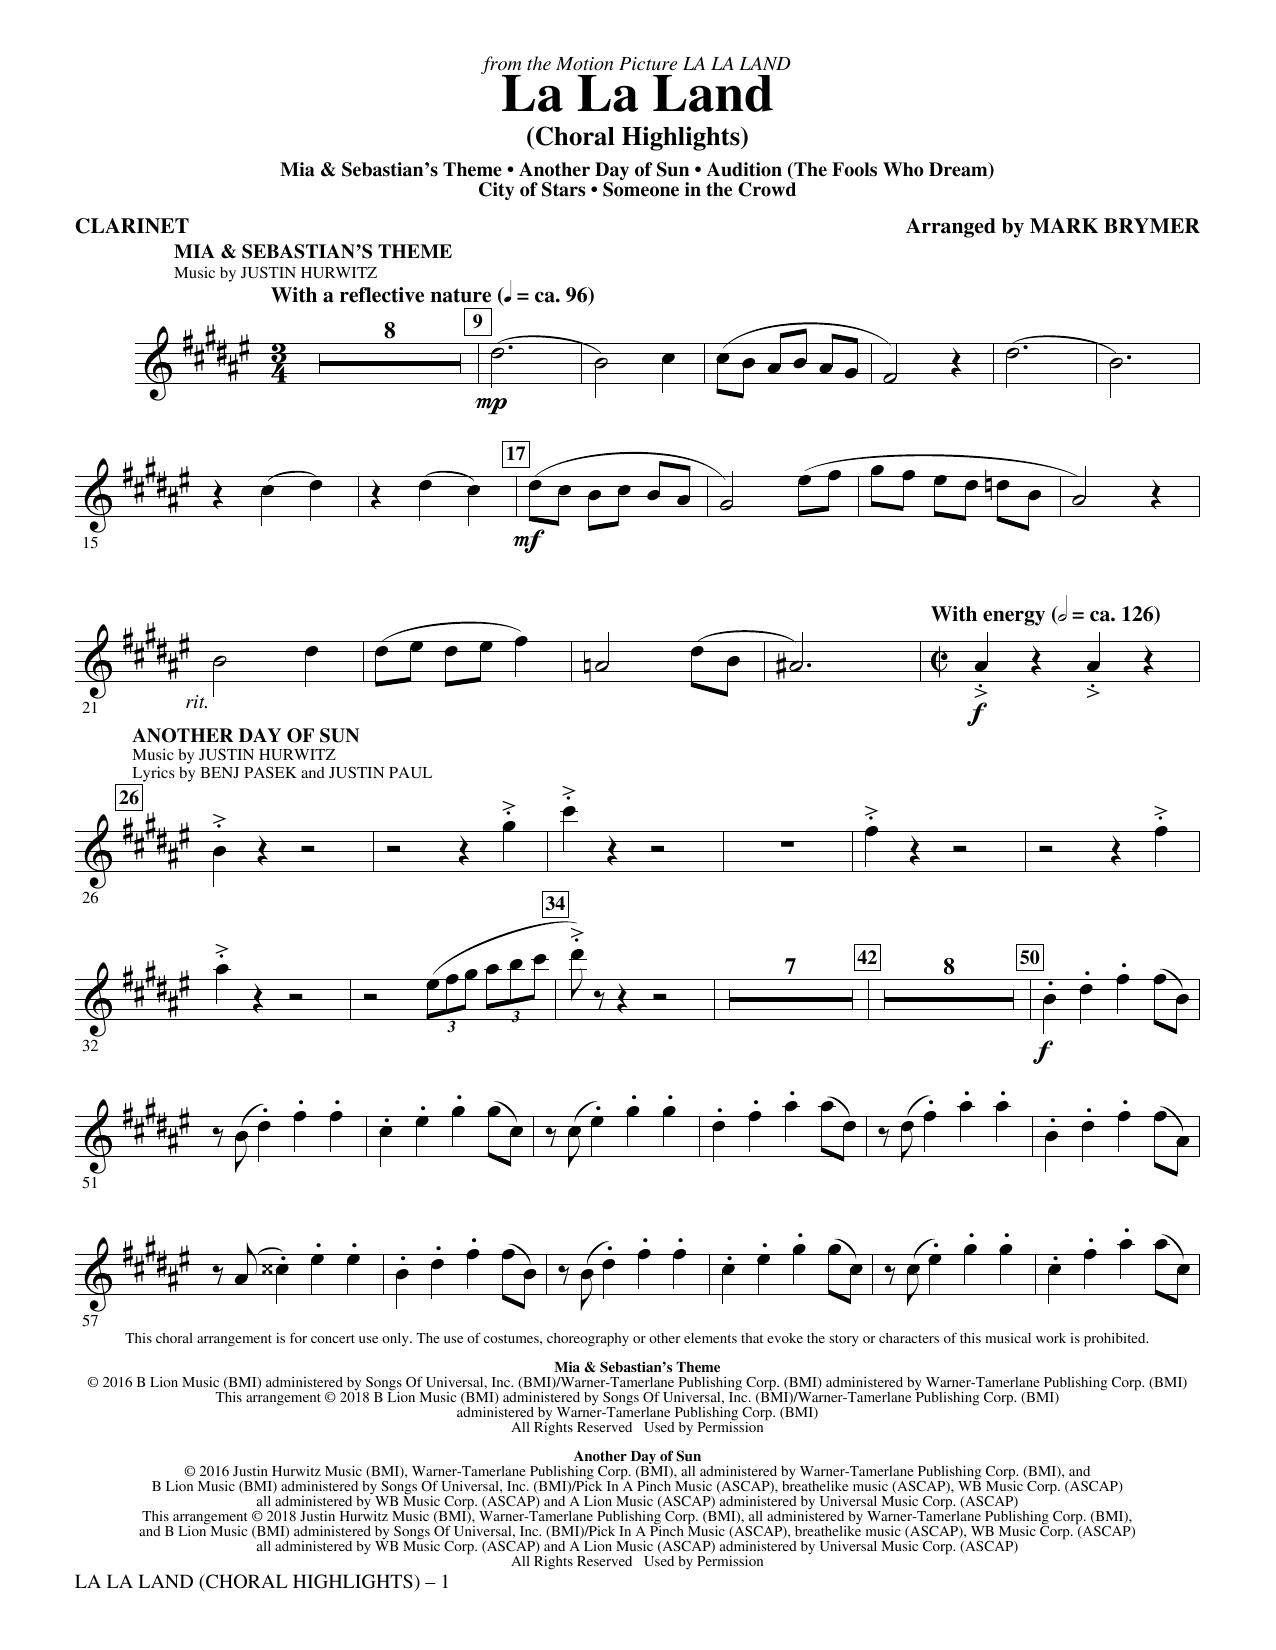 La La Land: Choral Highlights - Clarinet Sheet Music